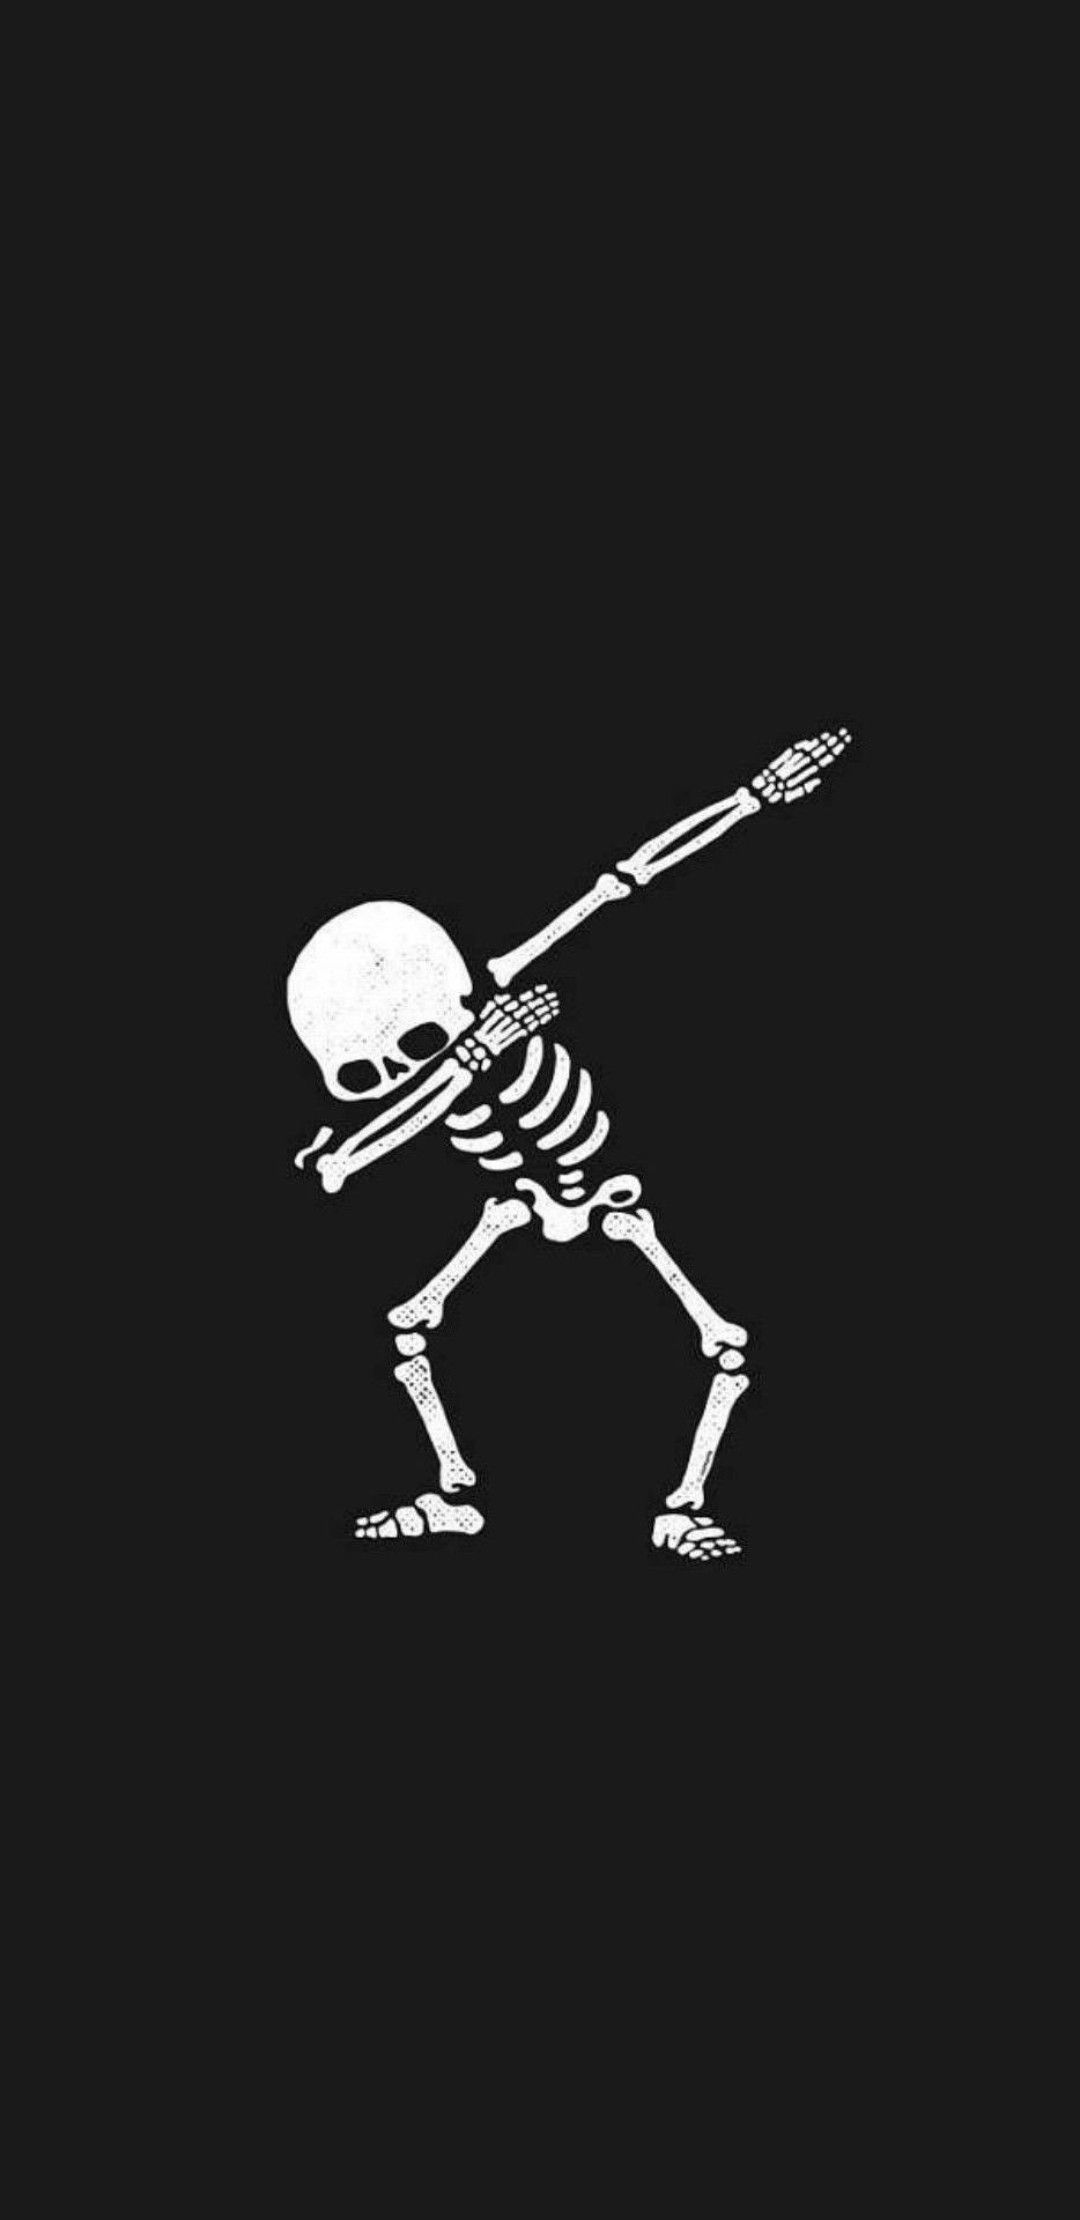 Spooky Scary Skeleton Skull Wallpaper Funny Wallpapers Halloween Wallpaper